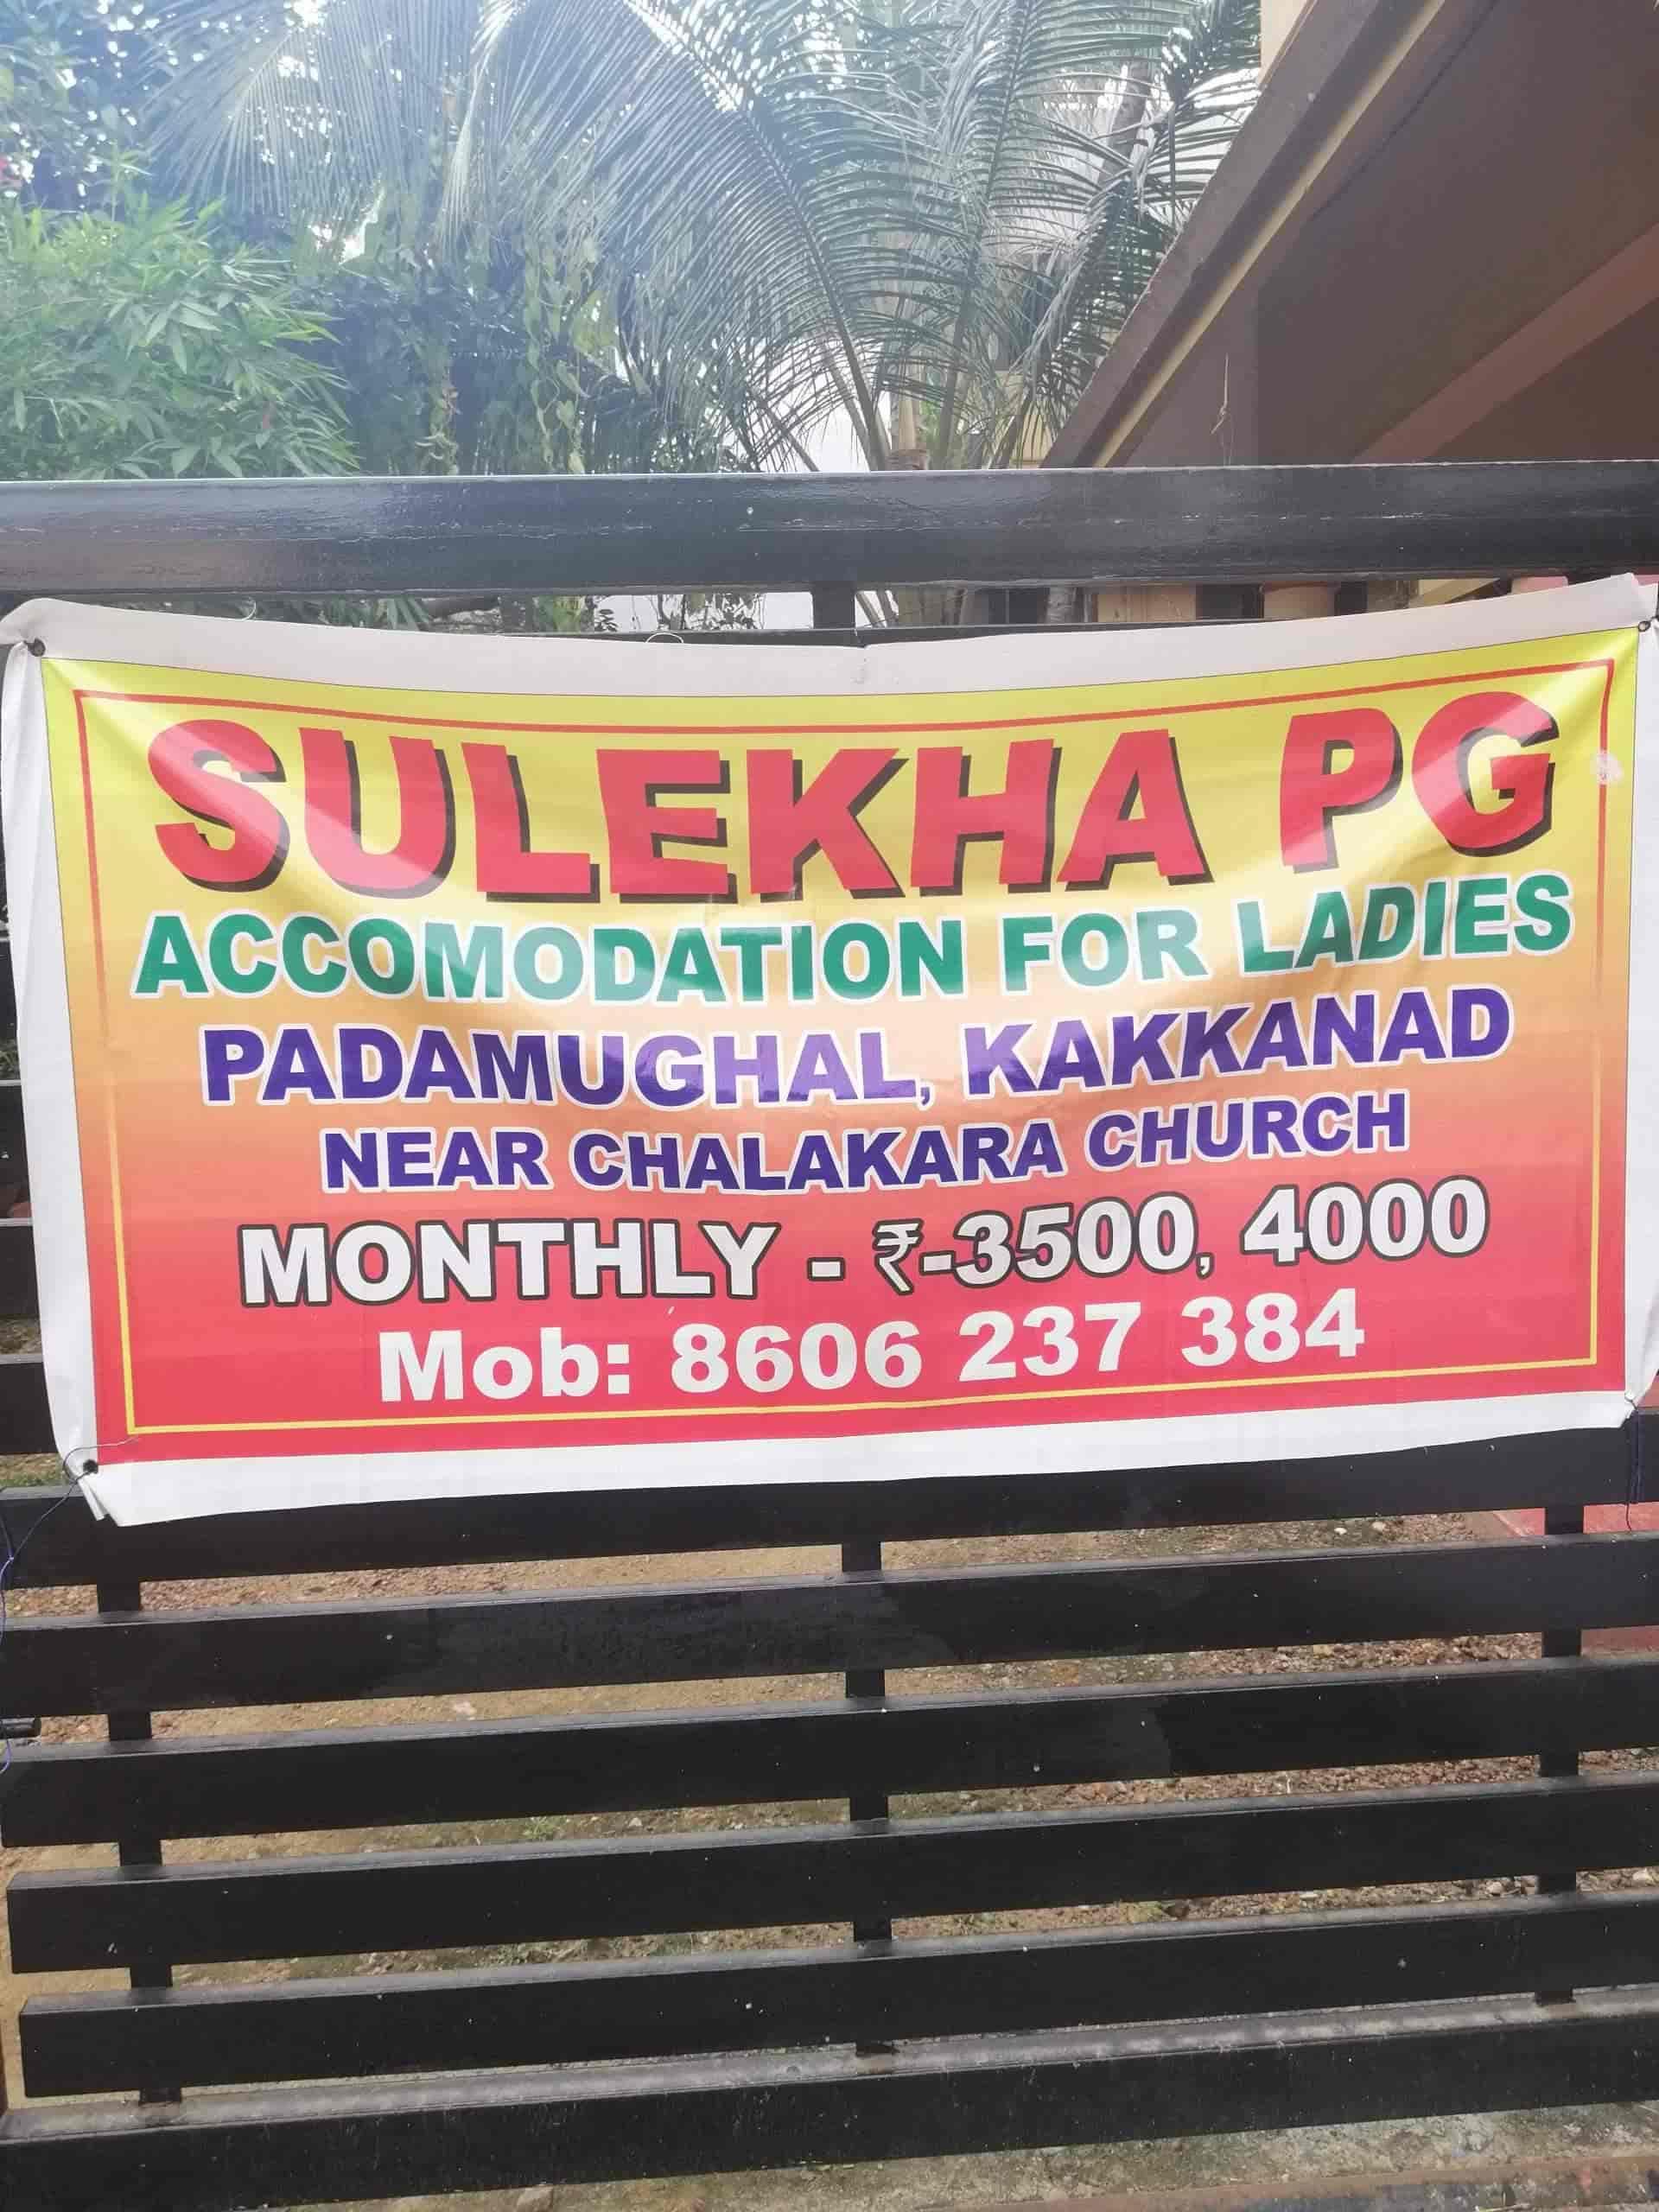 Sulekha Pg Accommodation For Ladies, Kakkanad - Paying Guest